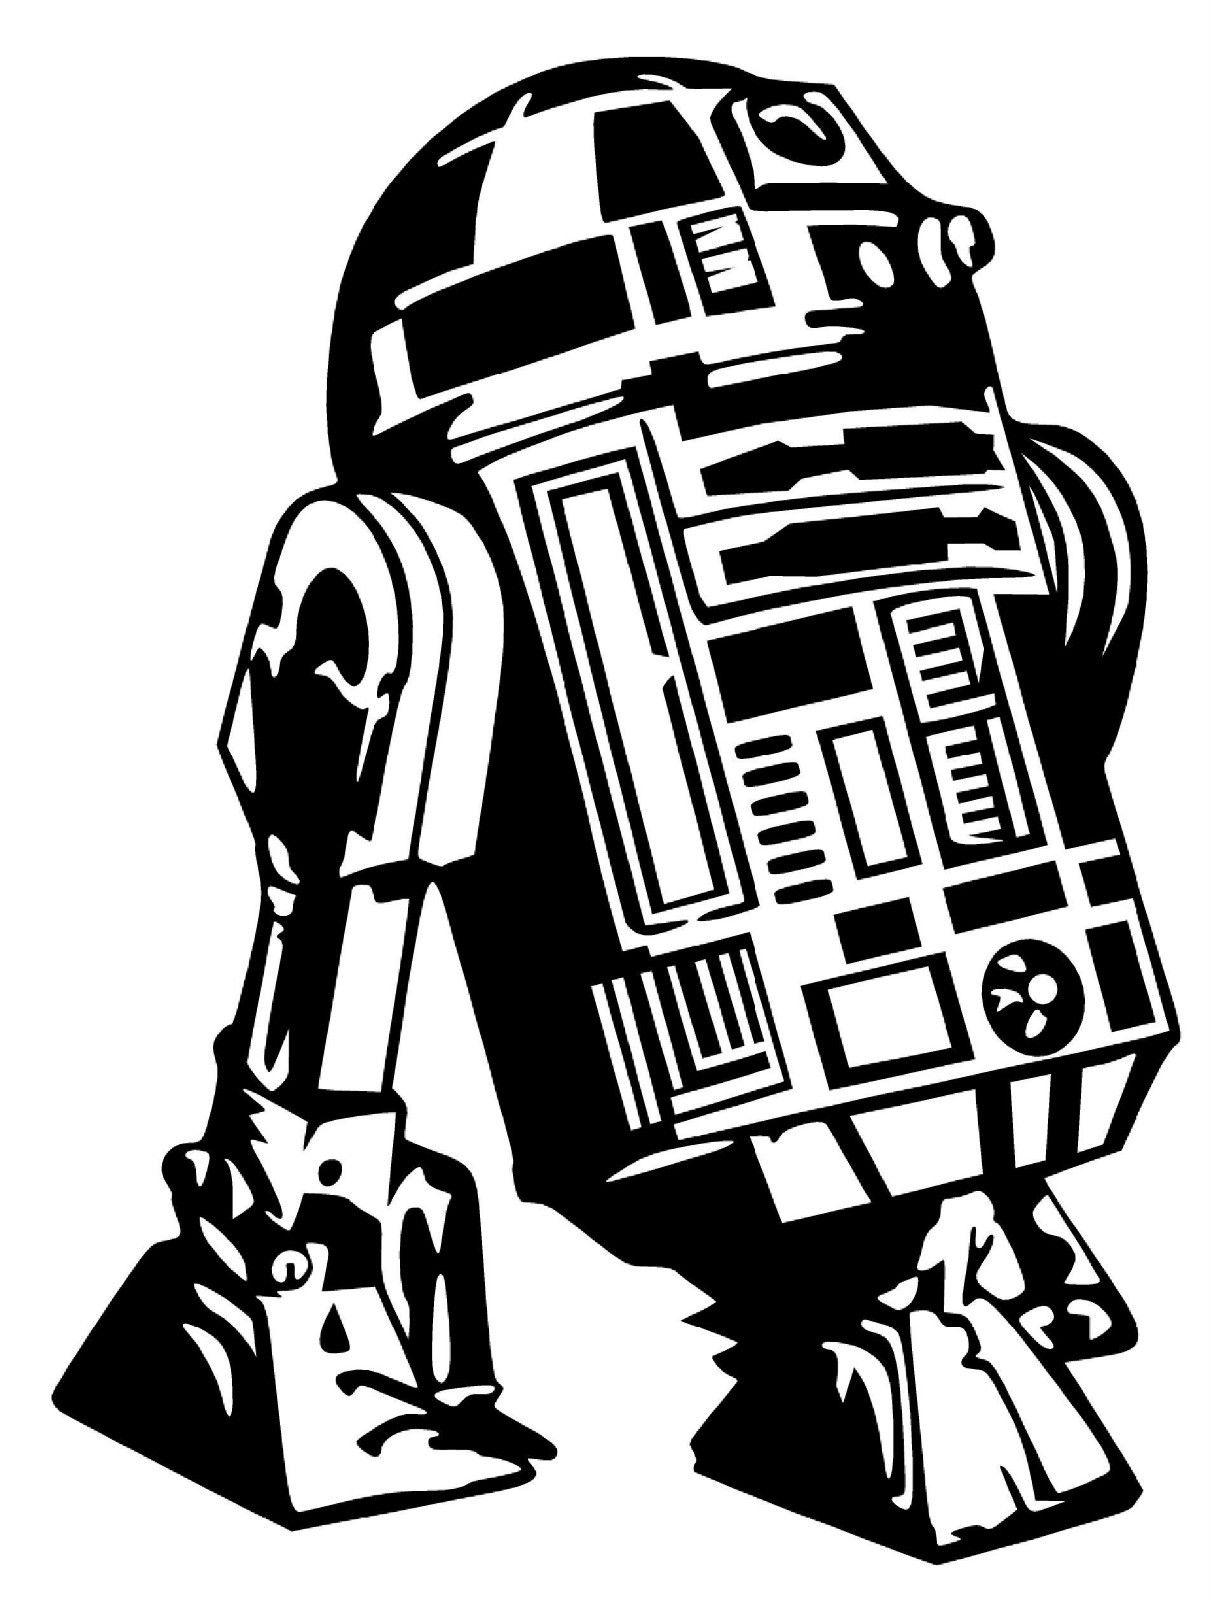 4 44 R2d2 Star Wars Empire The Force Awakens Vinyl Decal Sticker Car Bumper Window Ebay Home G Star Wars Stencil Star Wars Silhouette Star Wars Drawings [ 1600 x 1211 Pixel ]